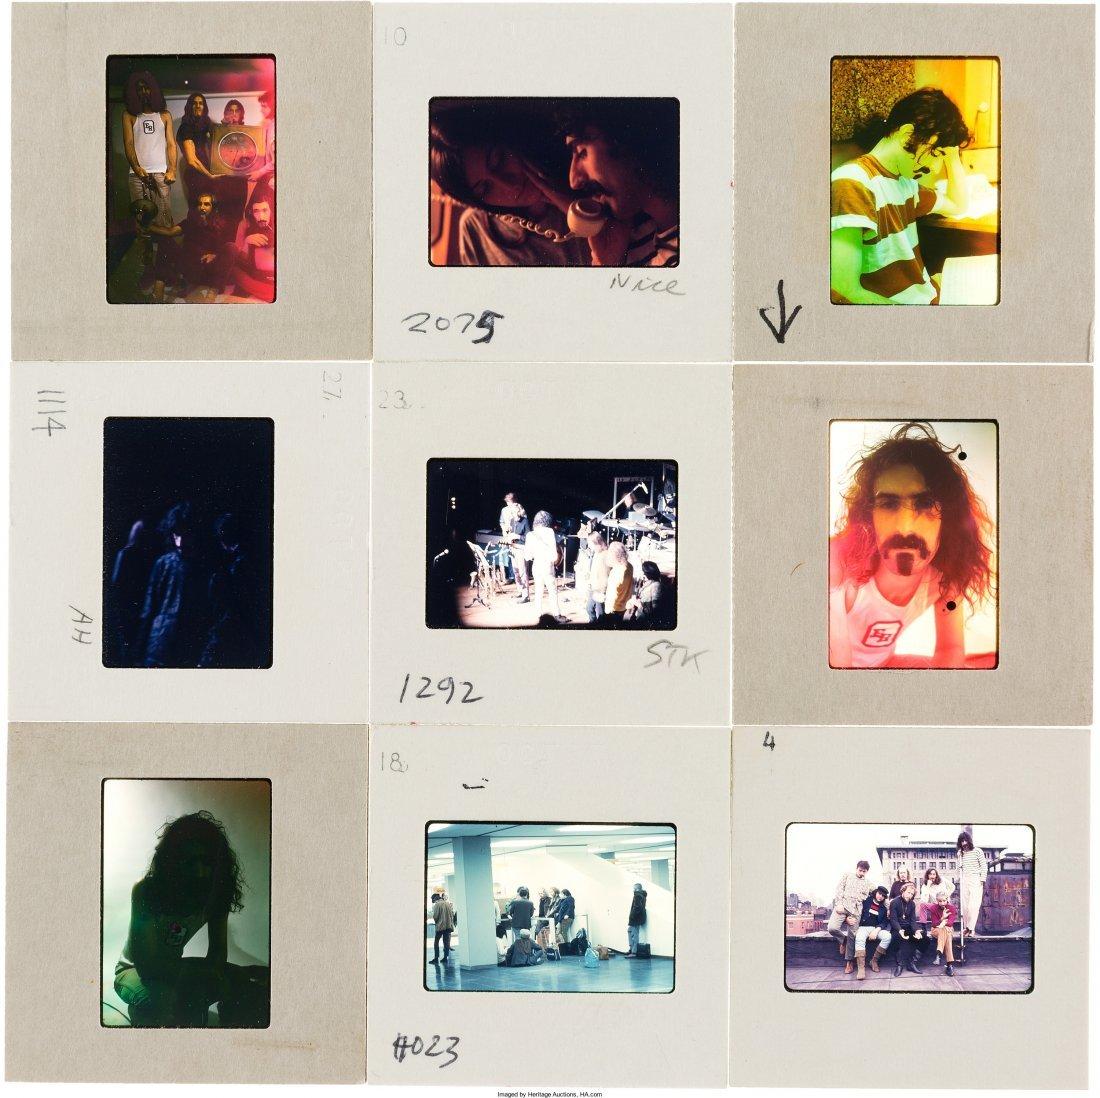 89578: Frank Zappa - Set of Fifty Color Photo Slides (L - 5